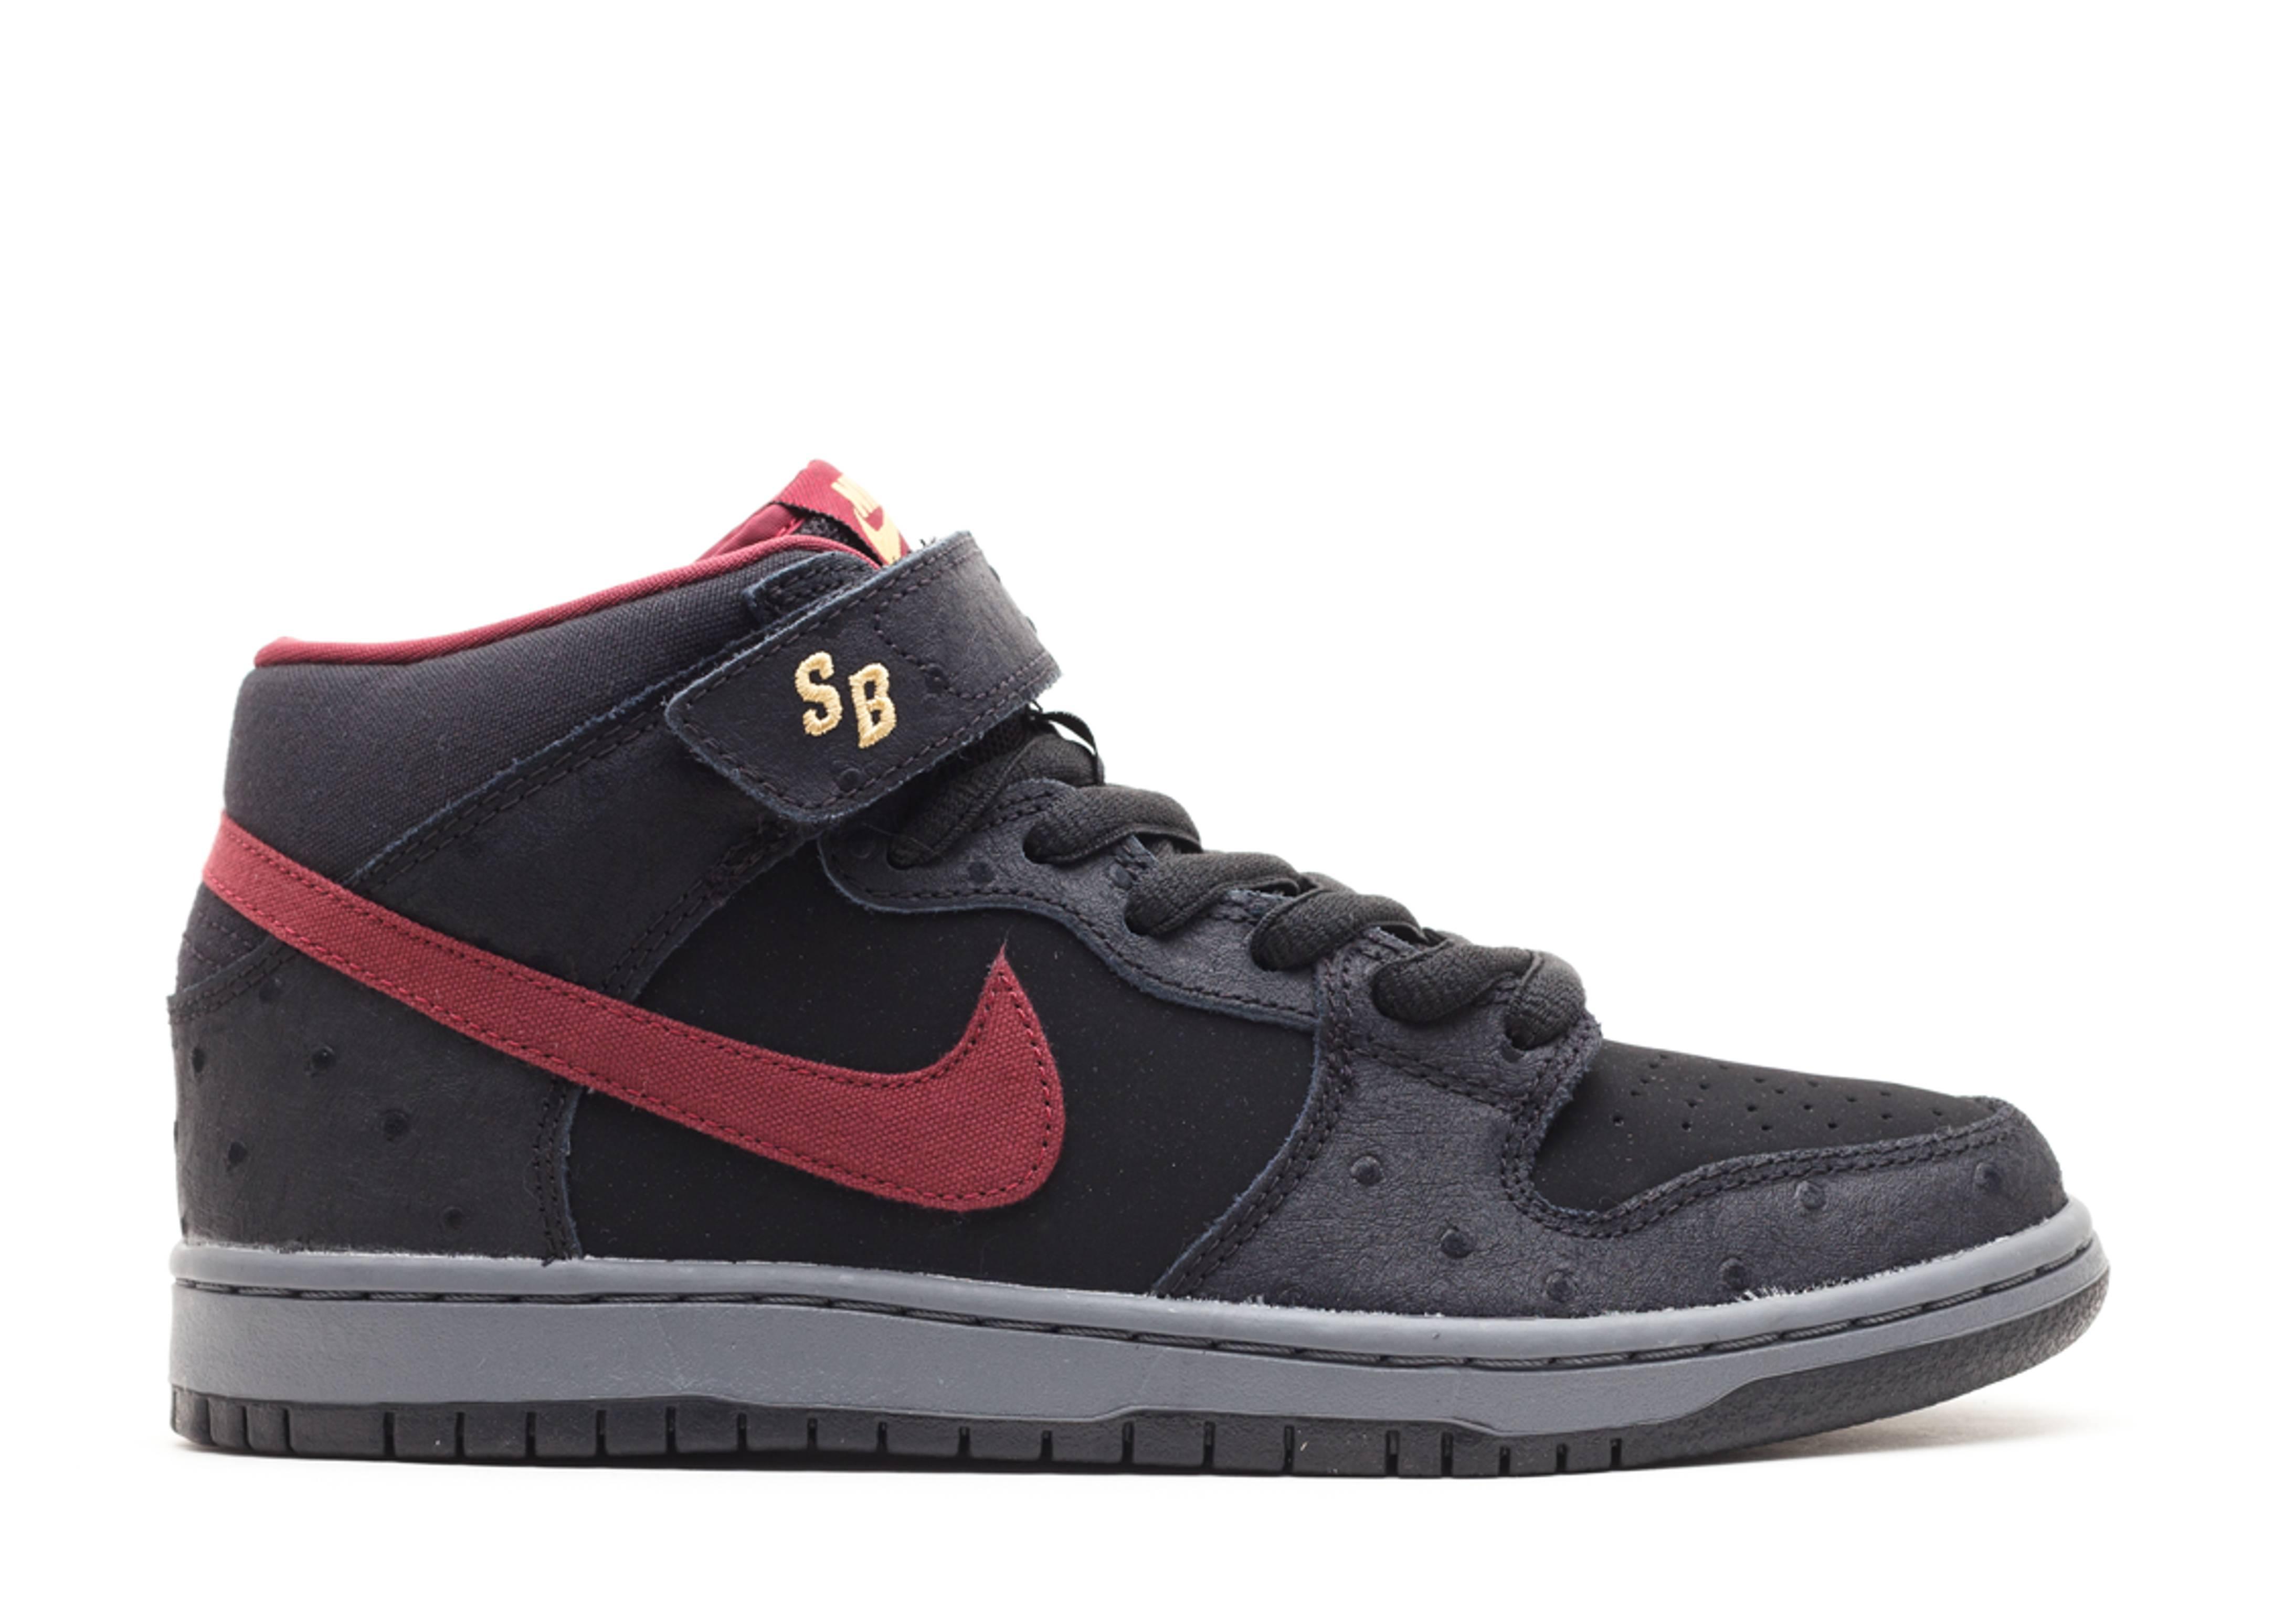 bfe95d93a3e0aa Dunk Mid Pro Sb - Nike - 314383 060 - black cherrywood red-light ...